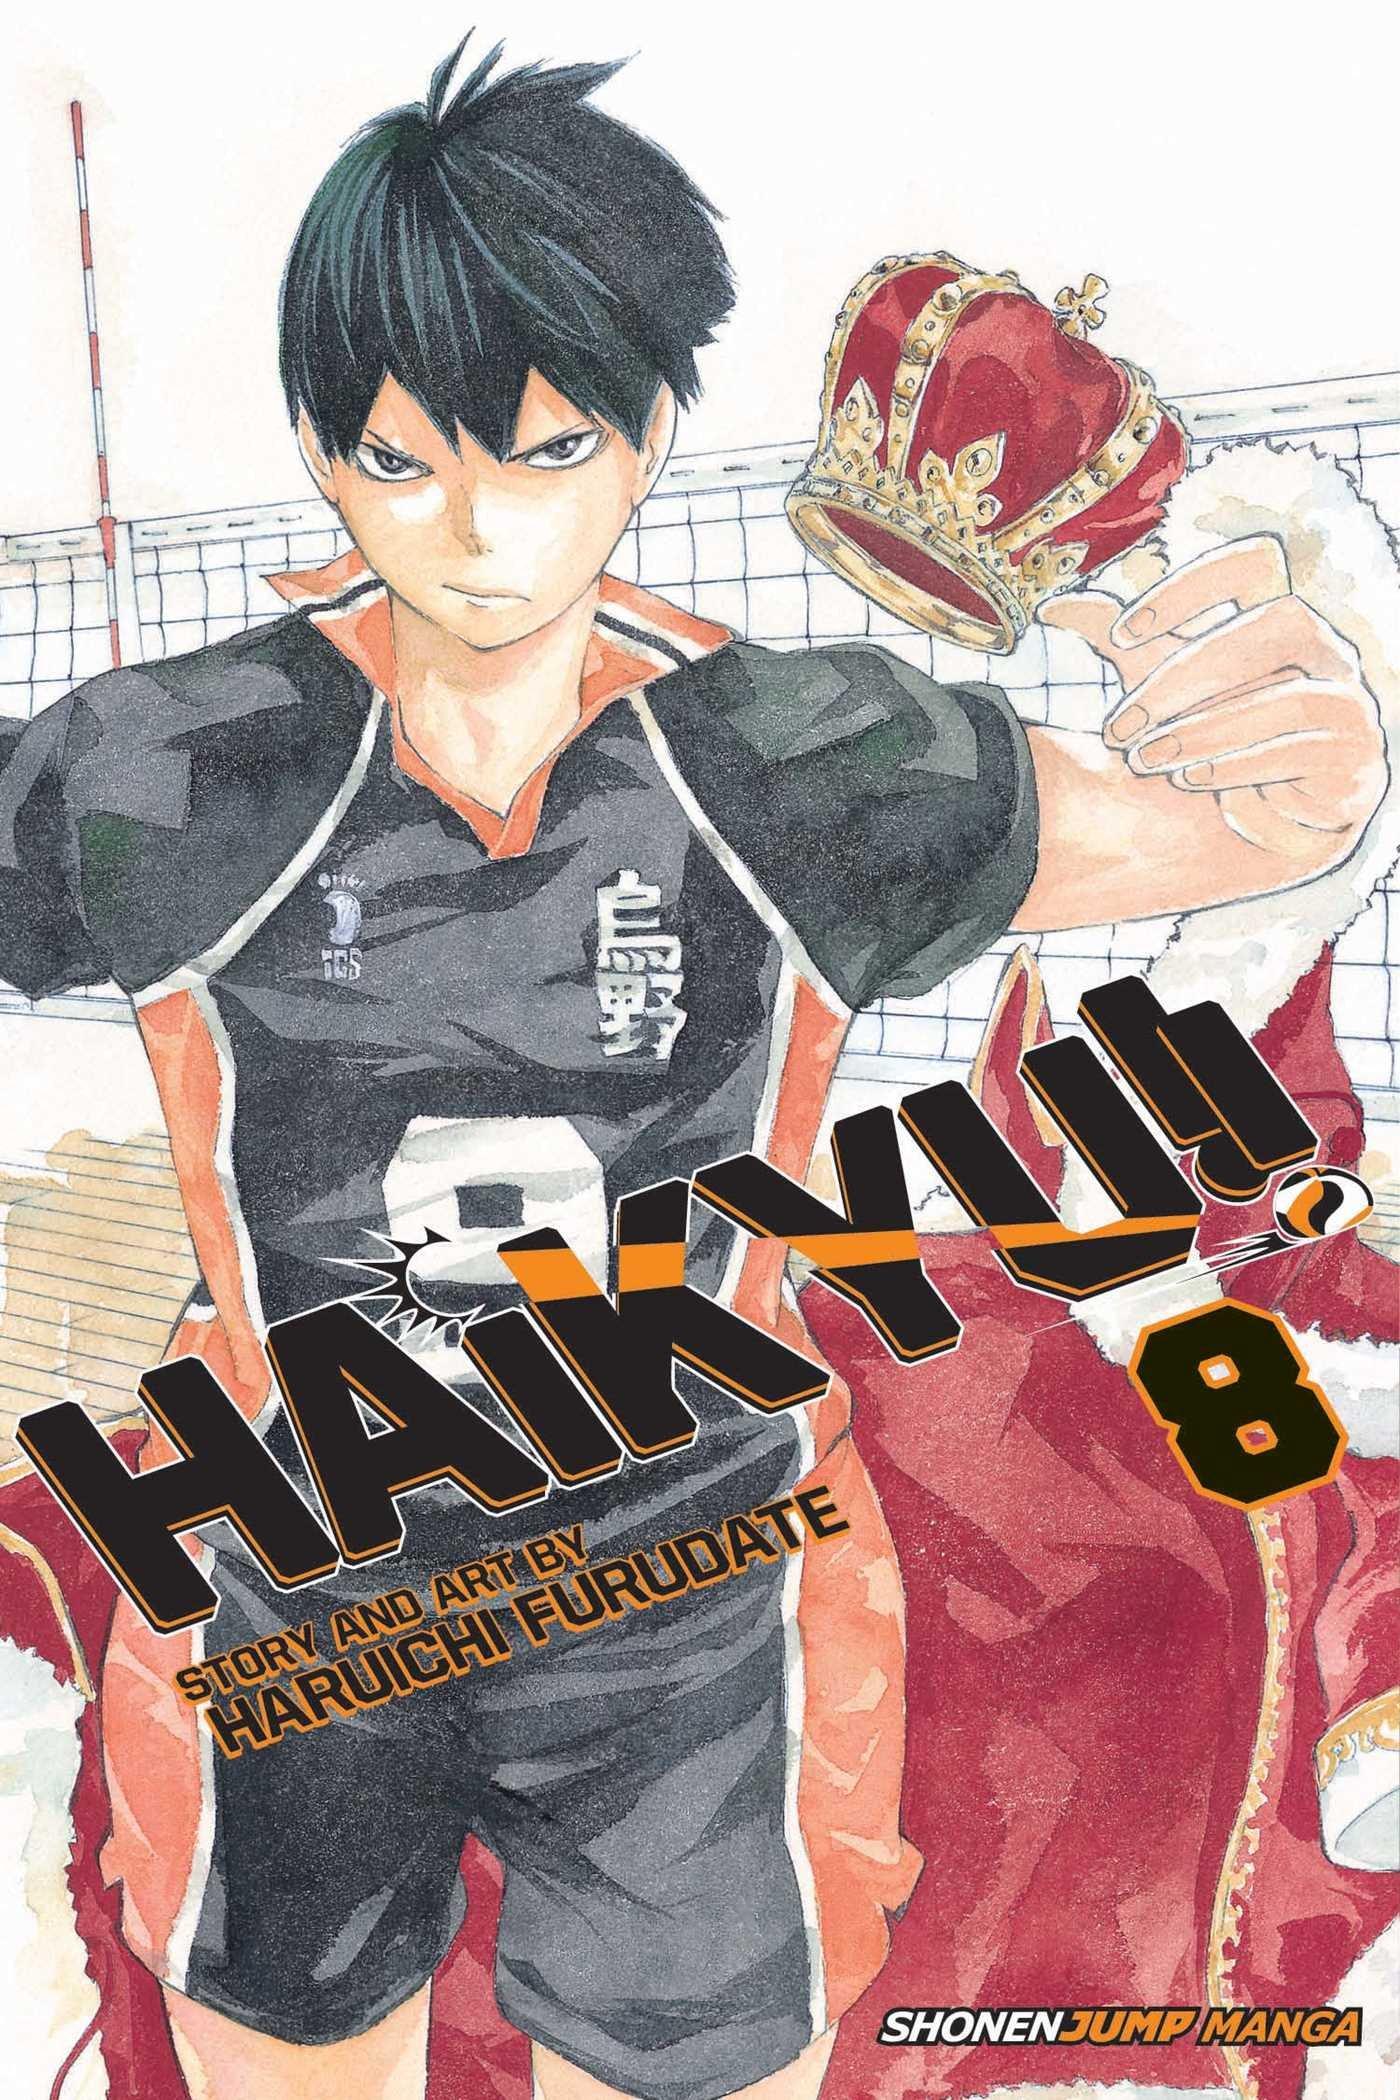 Haikyu!! - Tomo 08 - Haruichi Furudate - Manga ( Ingles)